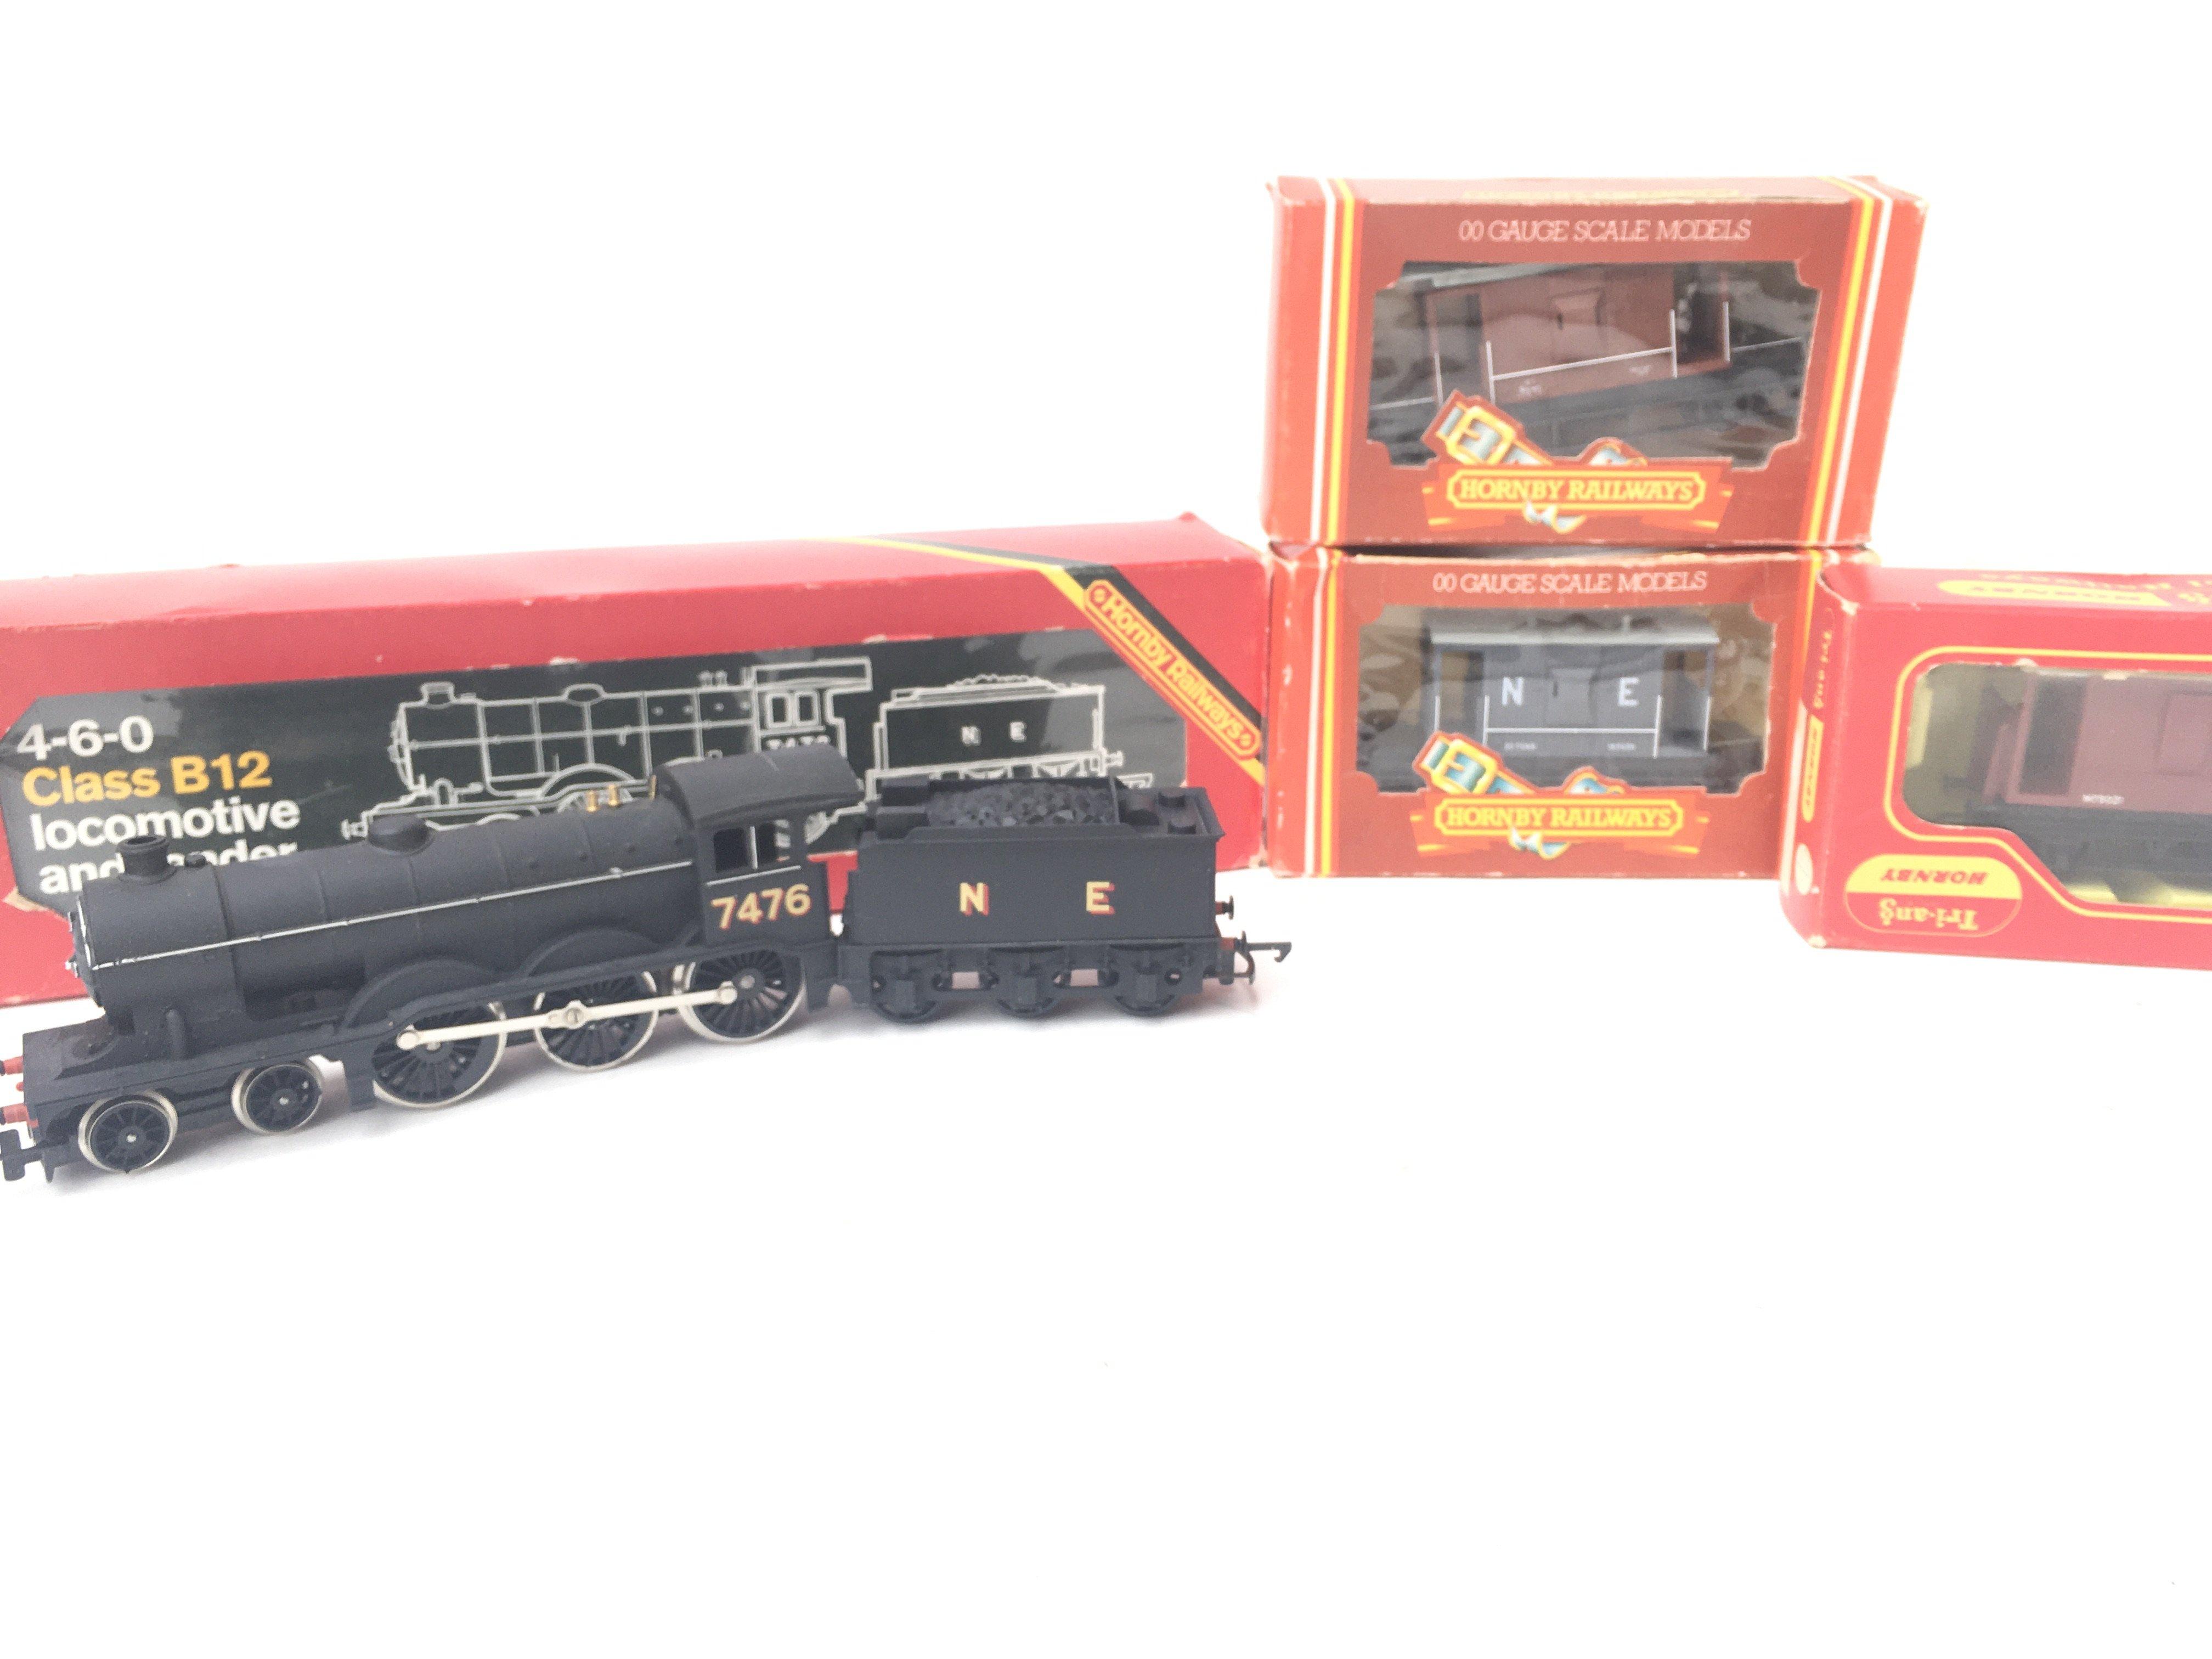 A Boxed Hornby 00 Gauge Class B12 Locomotive # R.0